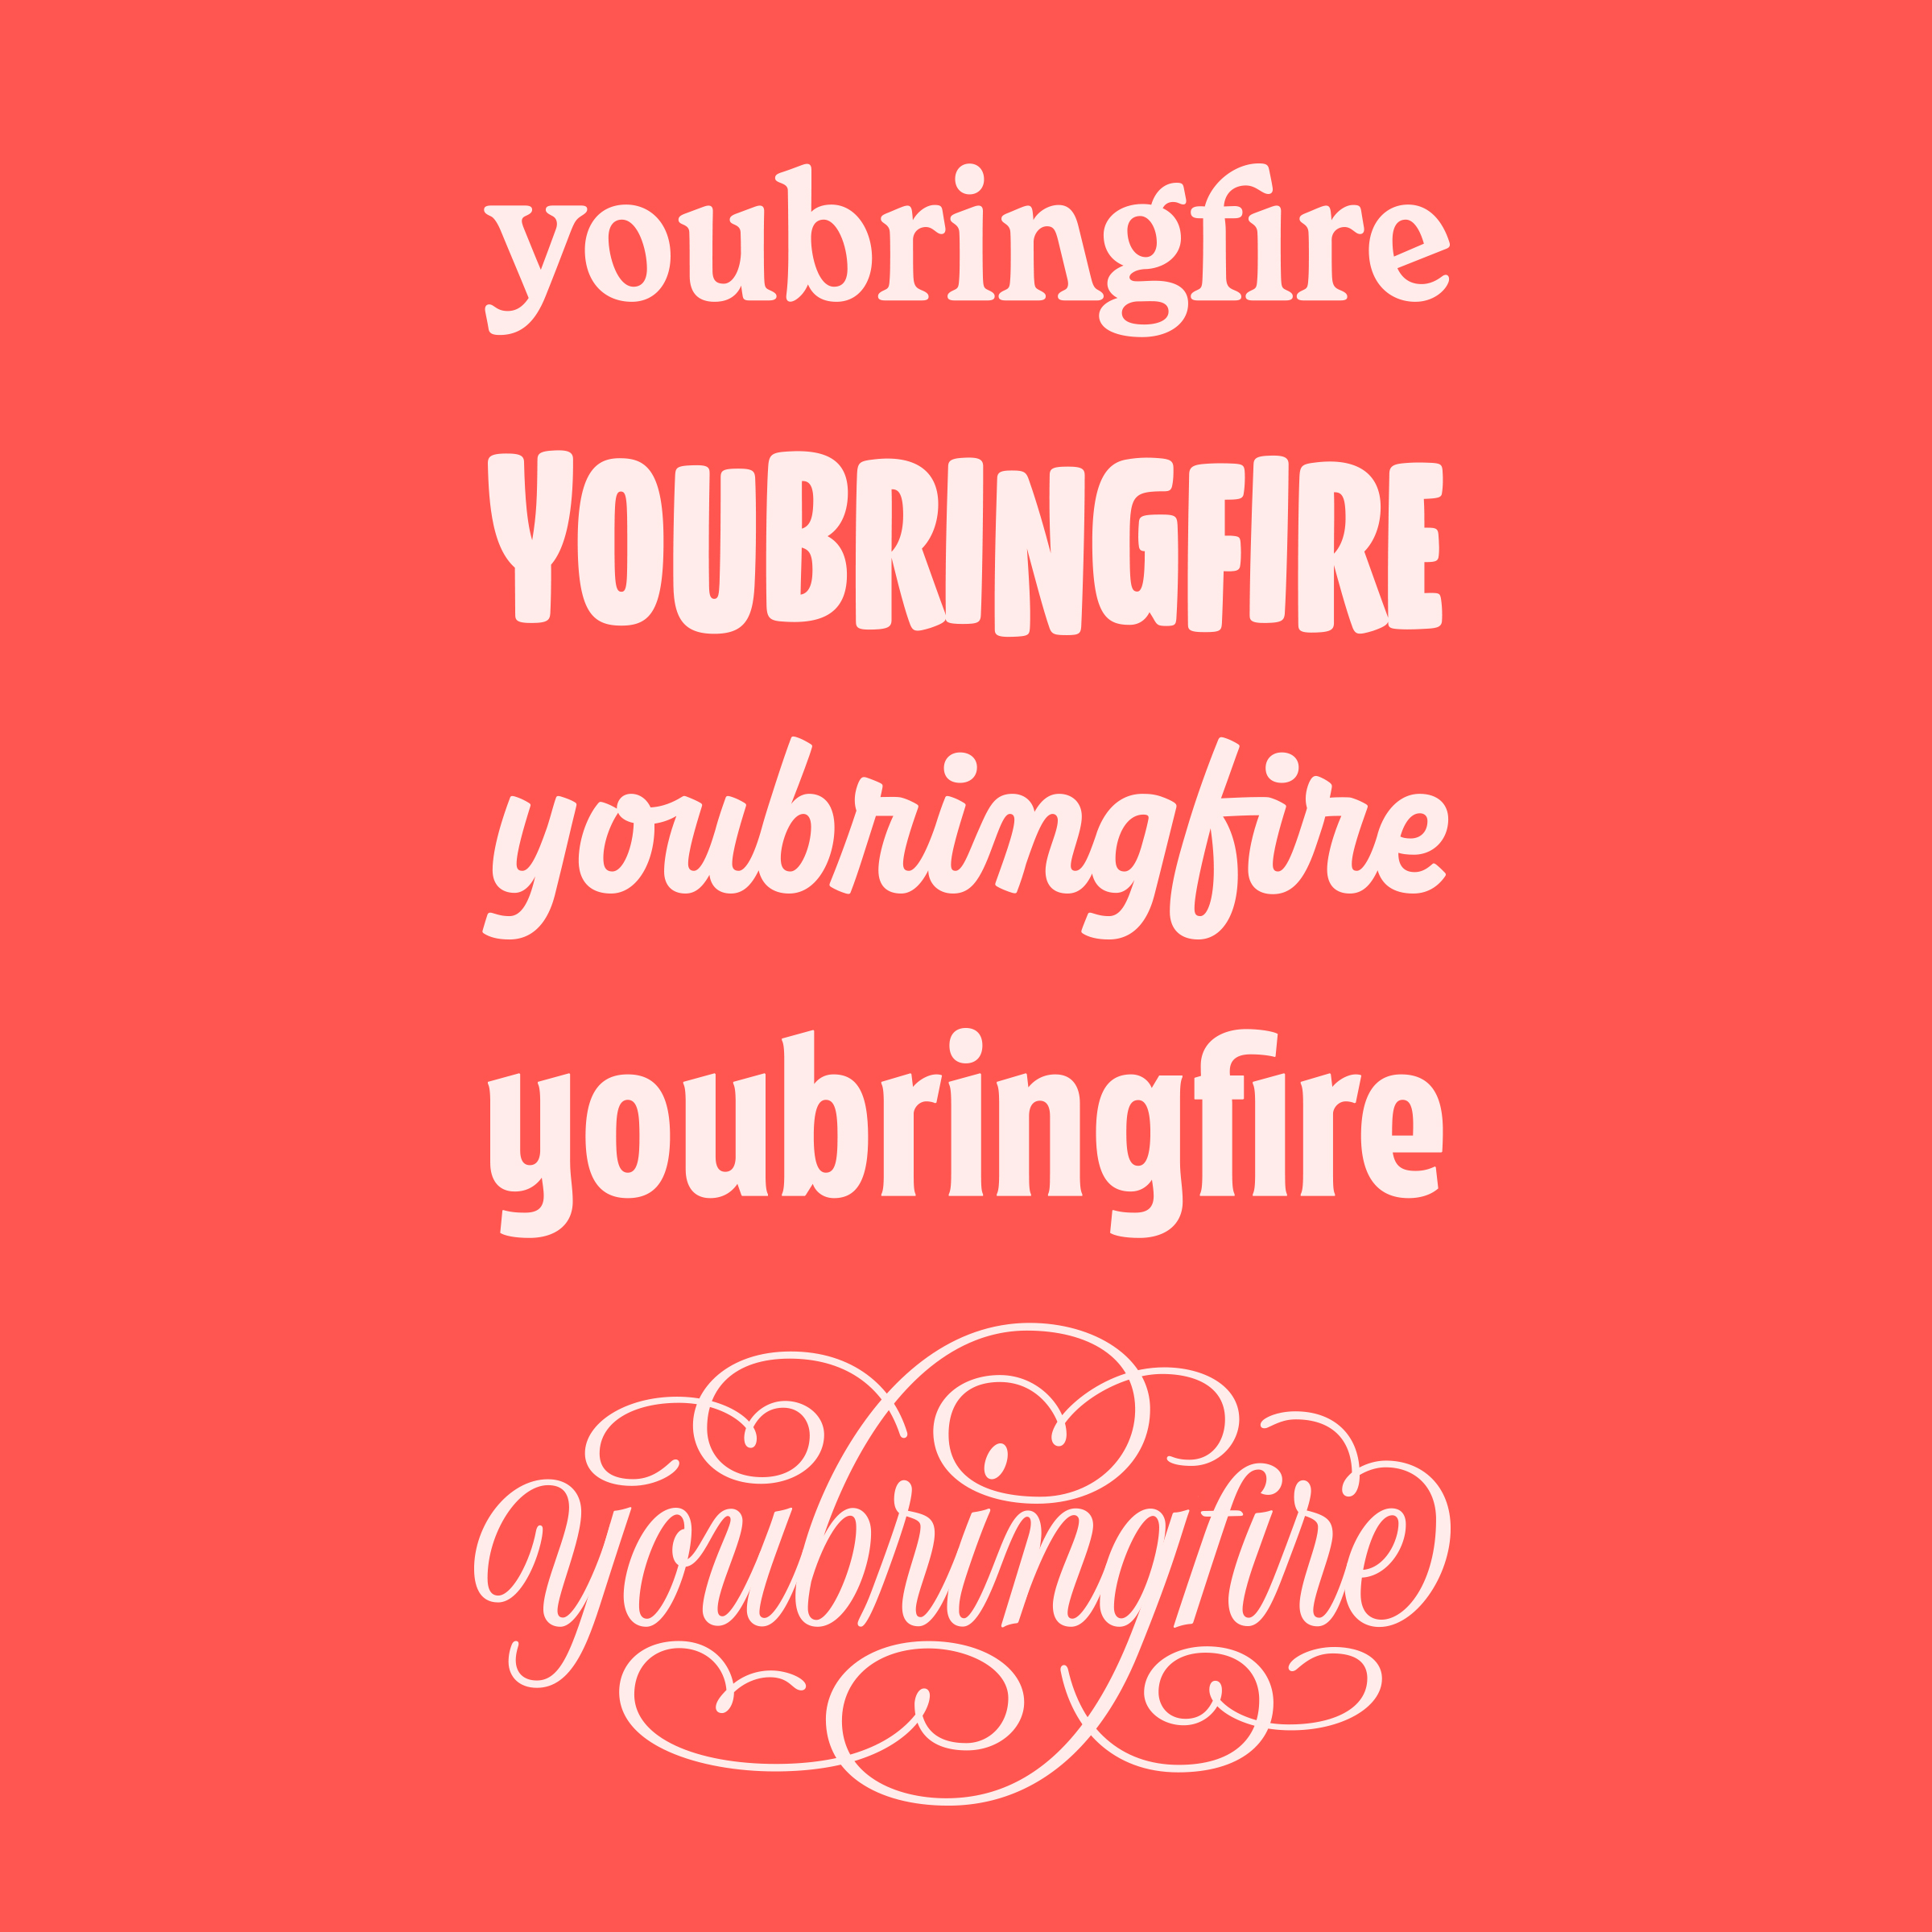 youbringfire-logotypes-02.jpg